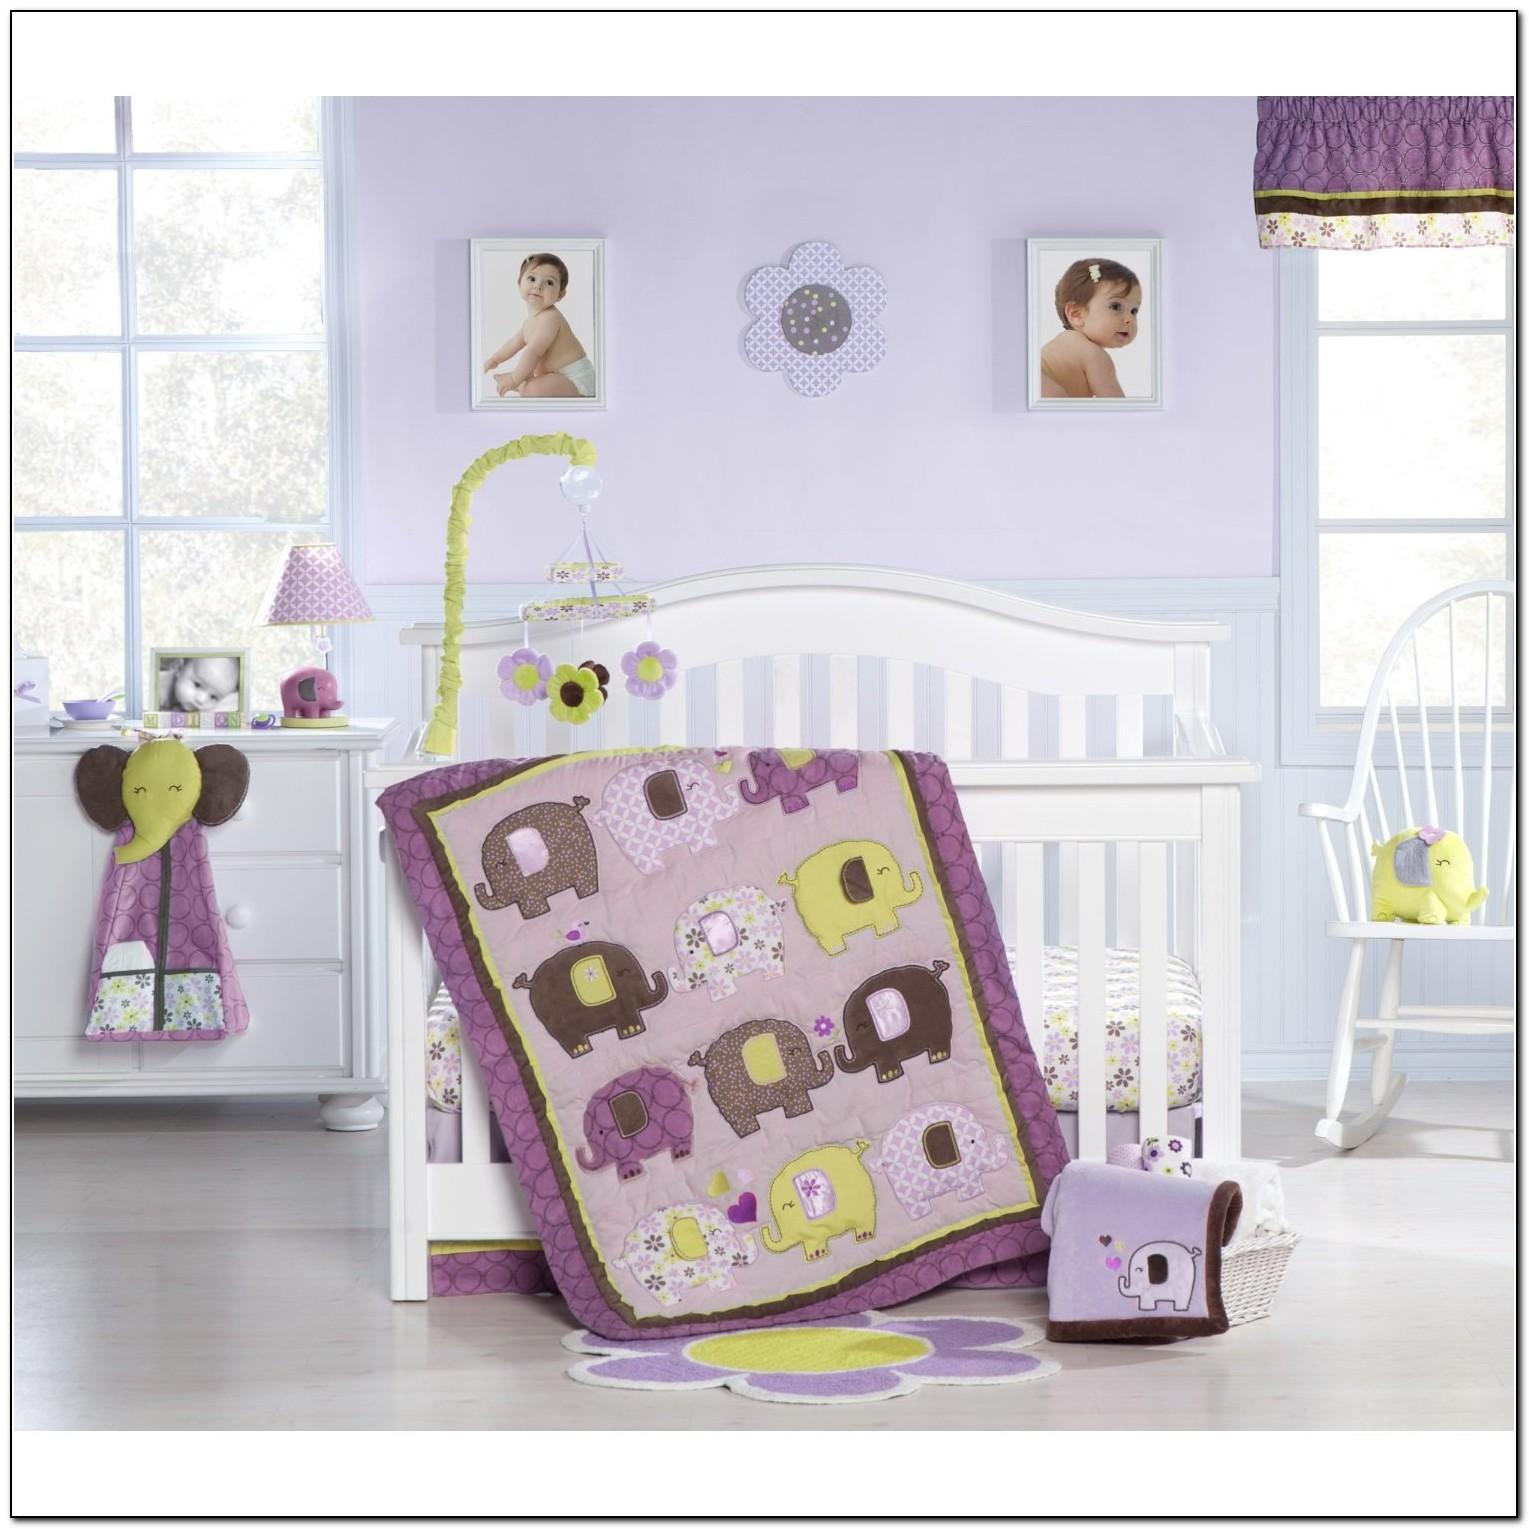 Elephant Baby Bedding For Girls